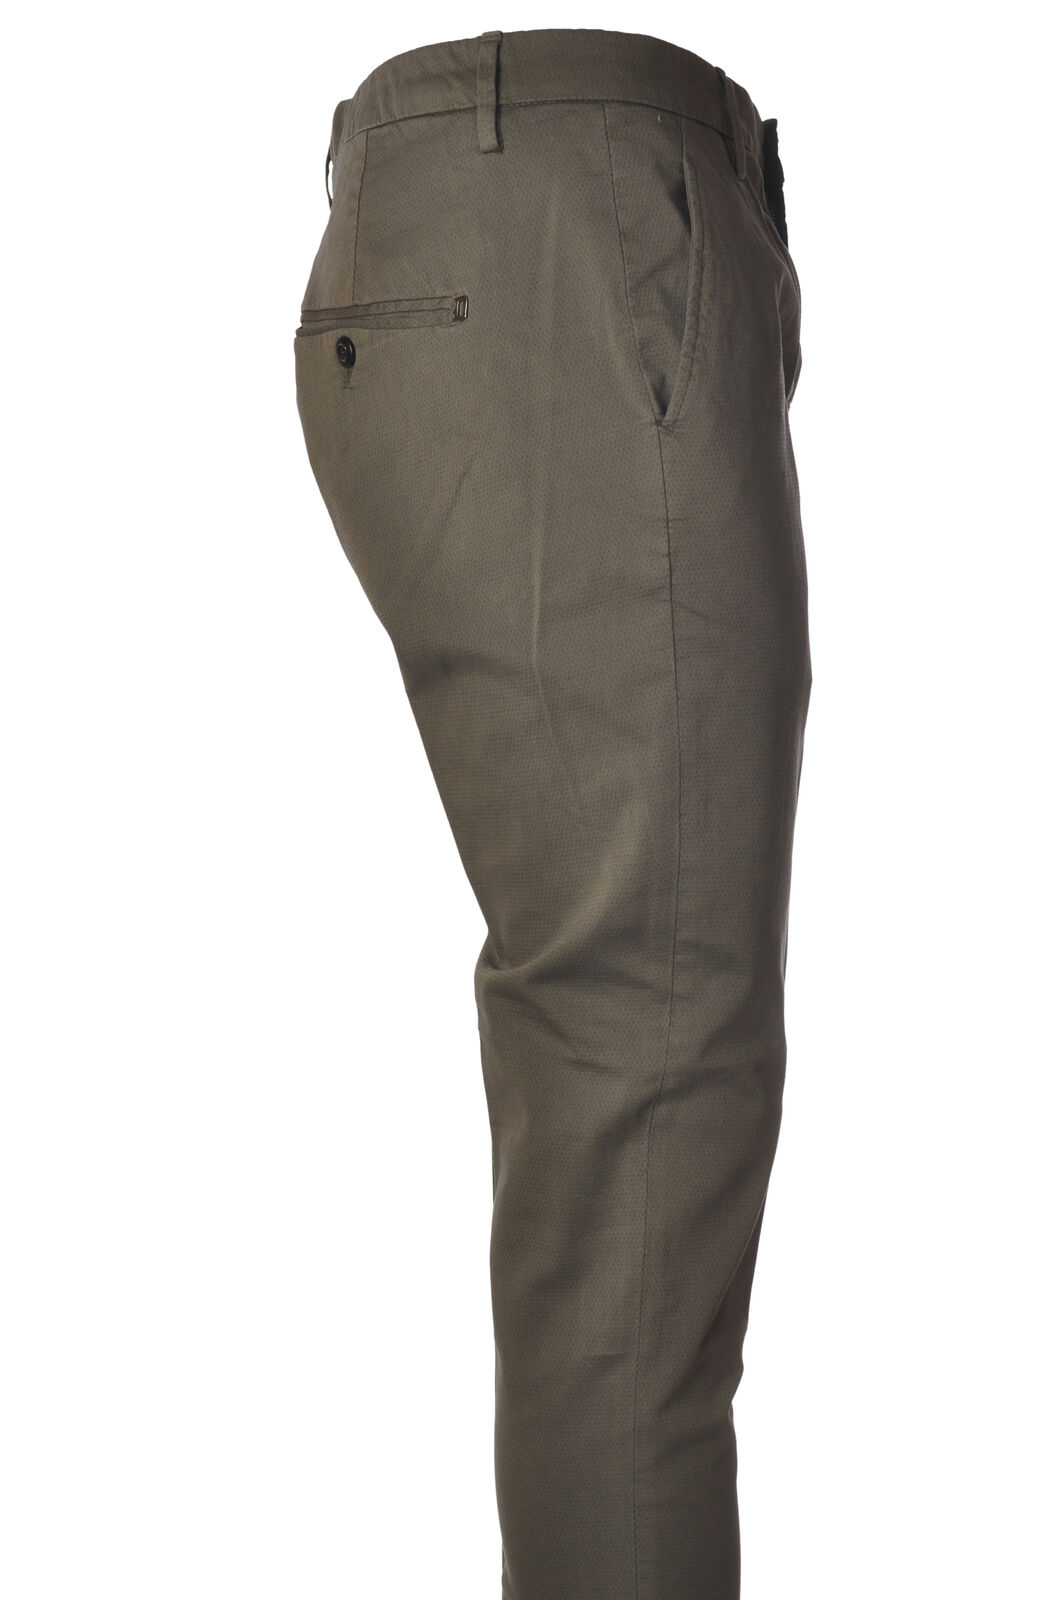 Dondup - Pants-Pants - Man - Green - 5925909C192435